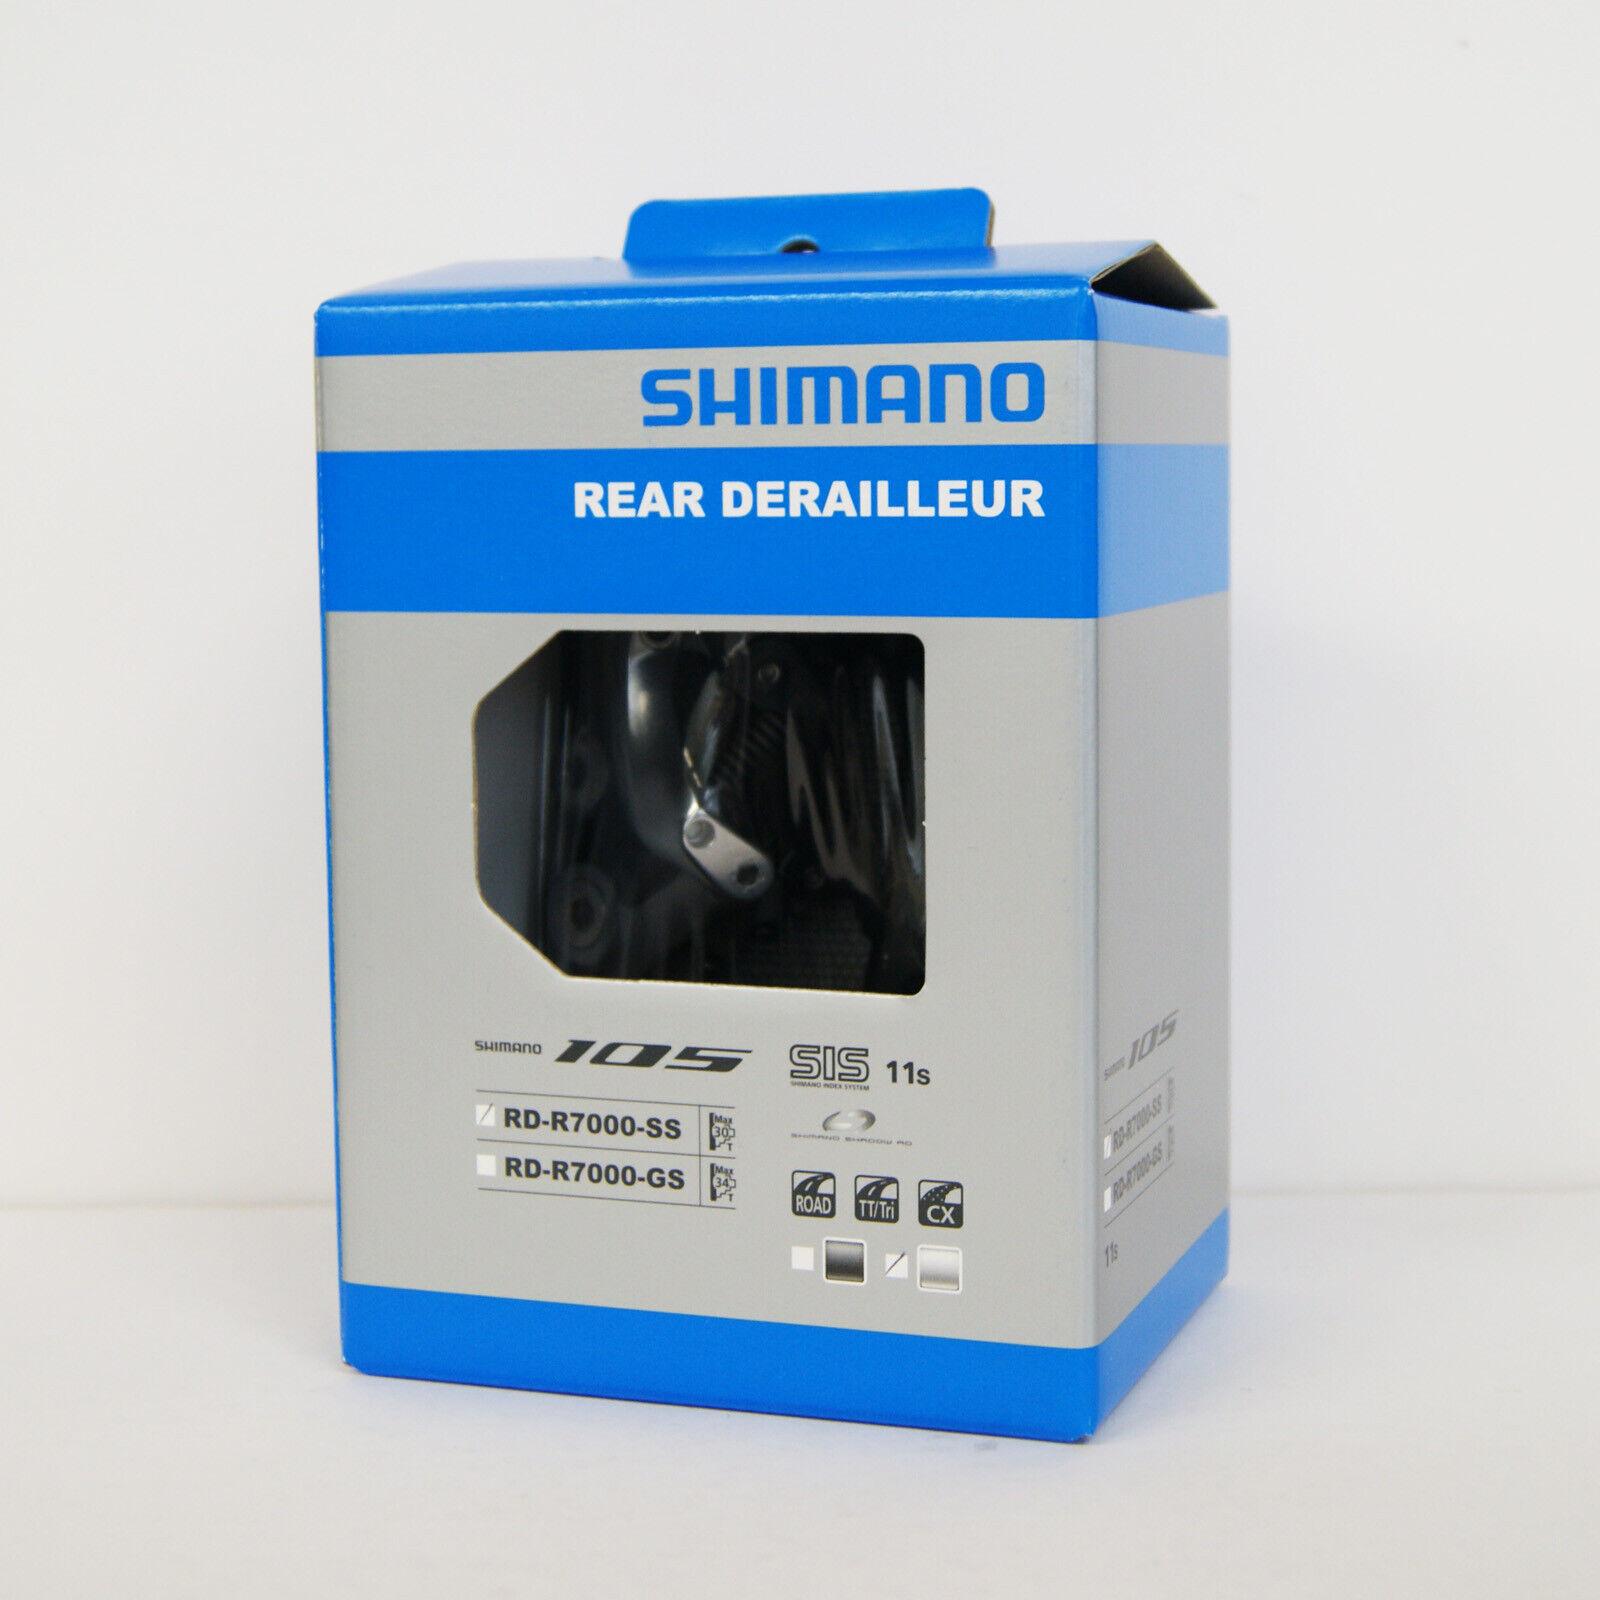 Shimano 105 RD-R7000 11-Speed Rear Derailleur GS Direct Mount Black IRDR7000GSL